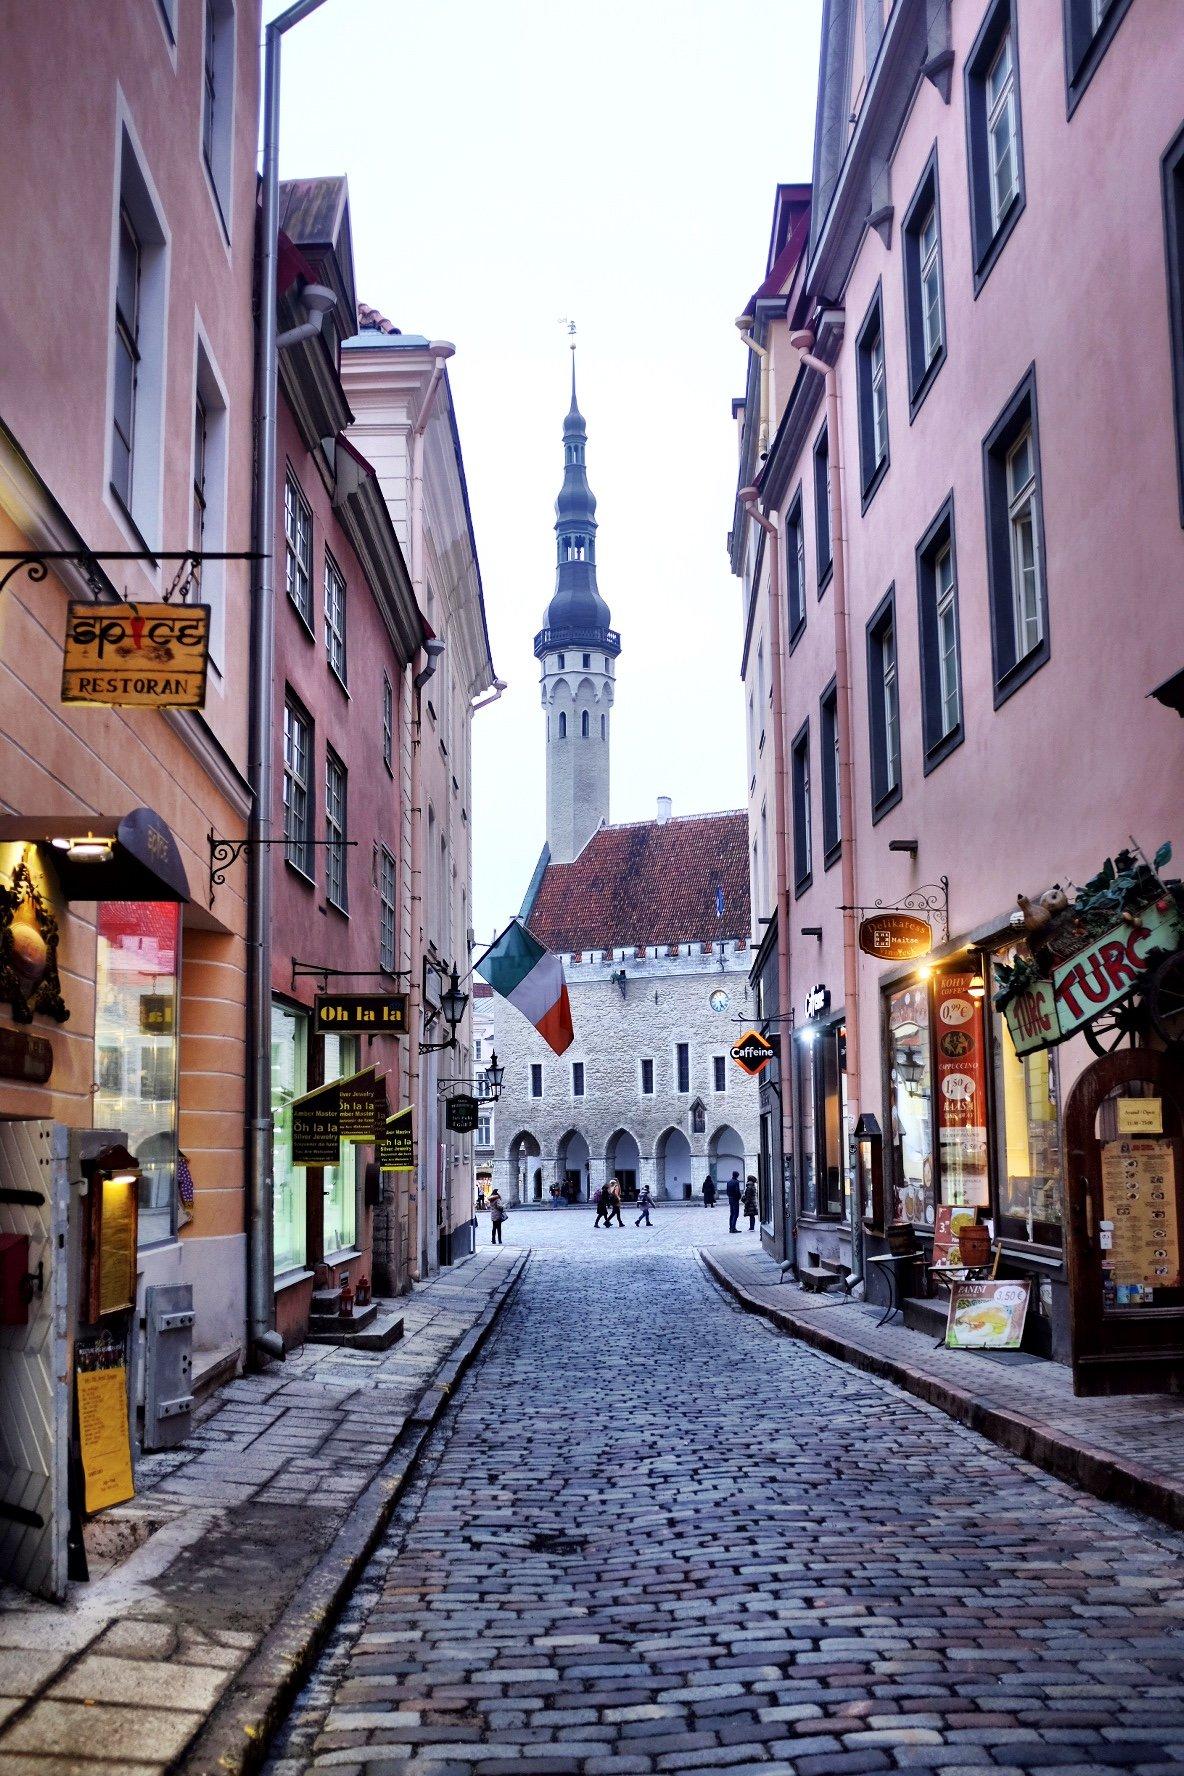 Town Hall of Tallinn seen from a narrow alley